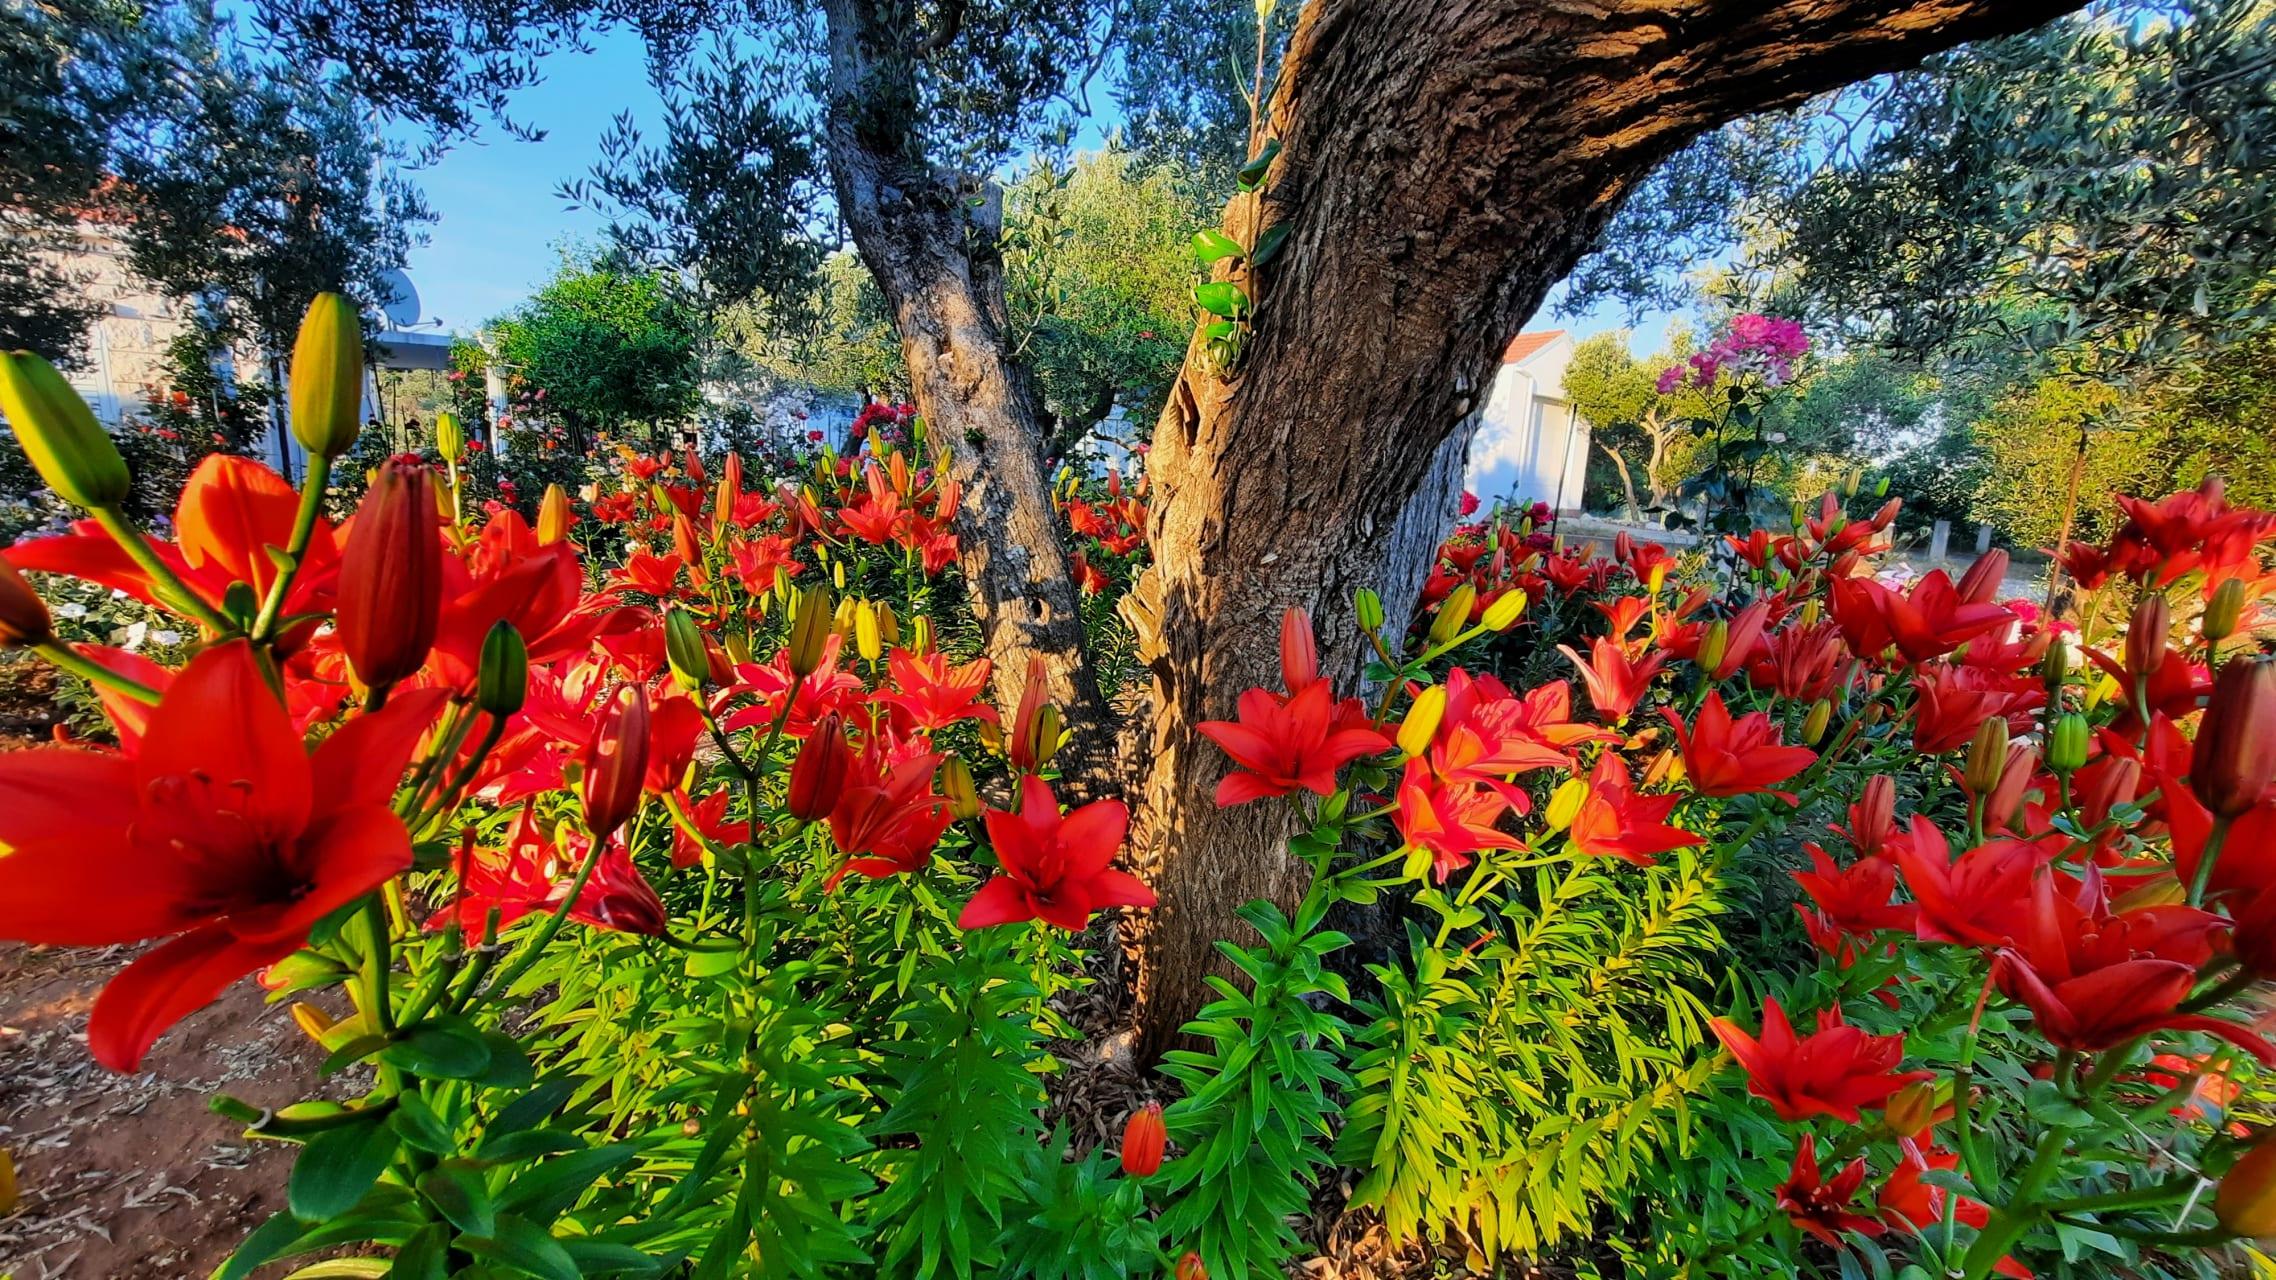 Korcula - Lilies Carnations Petunias Roses & Smurfs